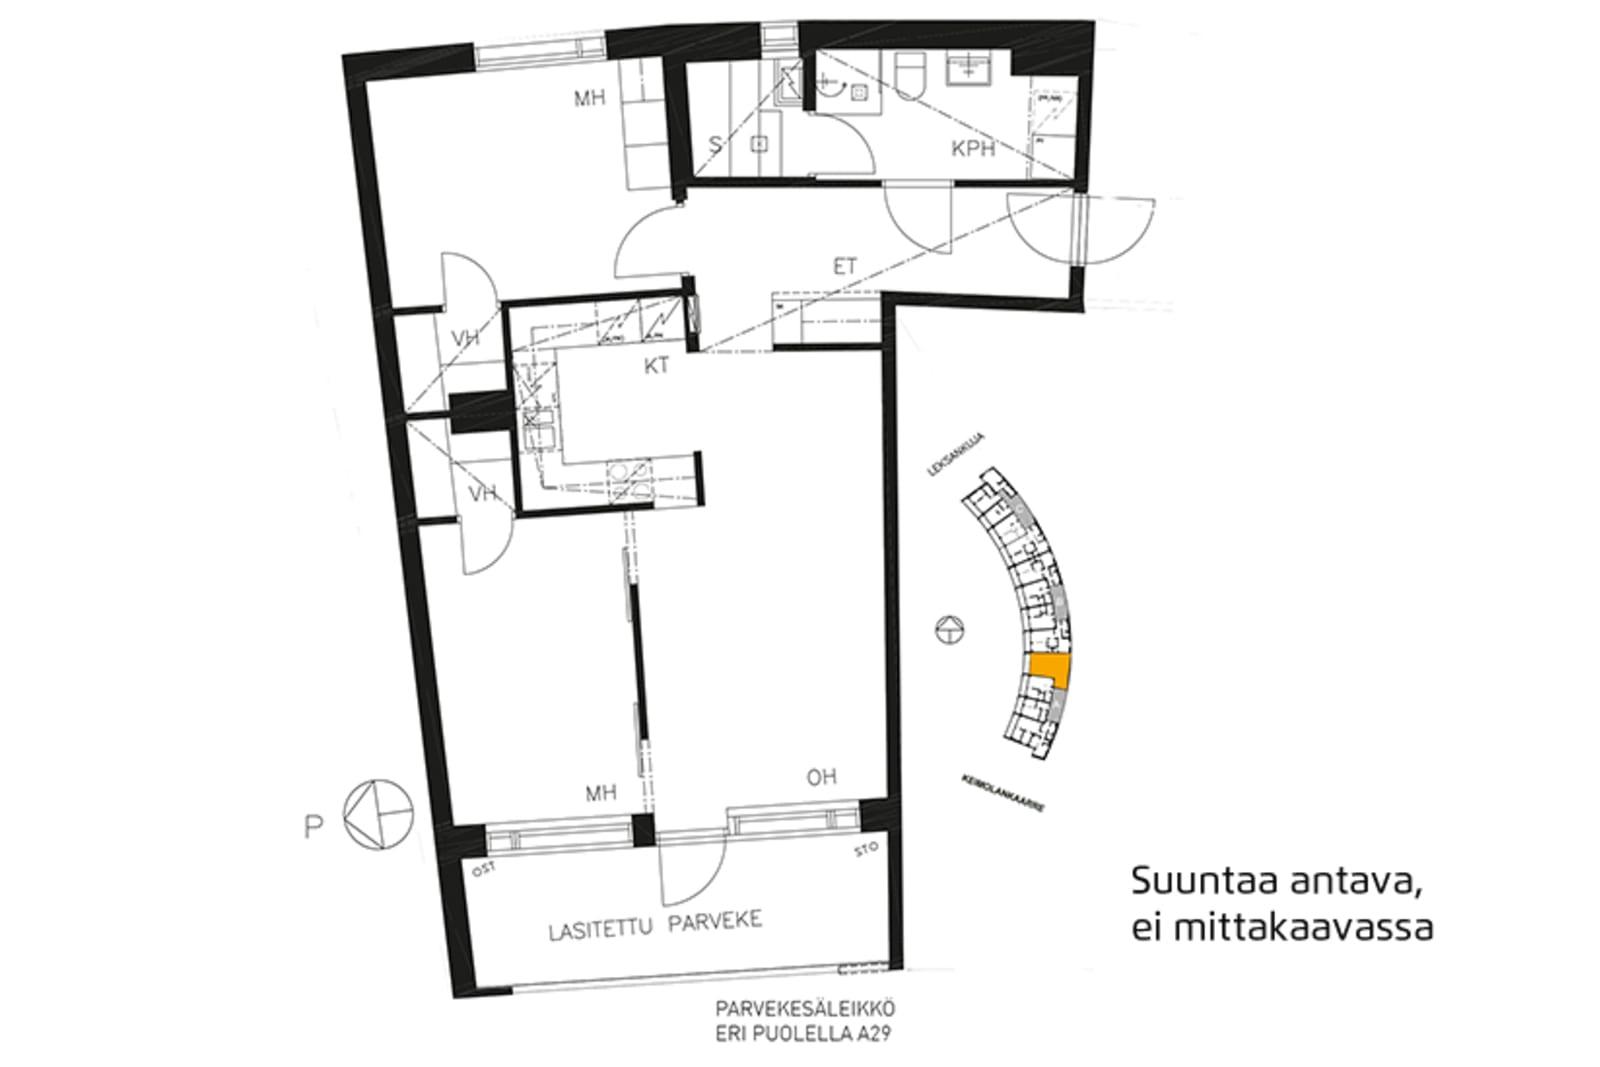 Vantaa, Keimolanmäki, Leksankuja 3 A 029